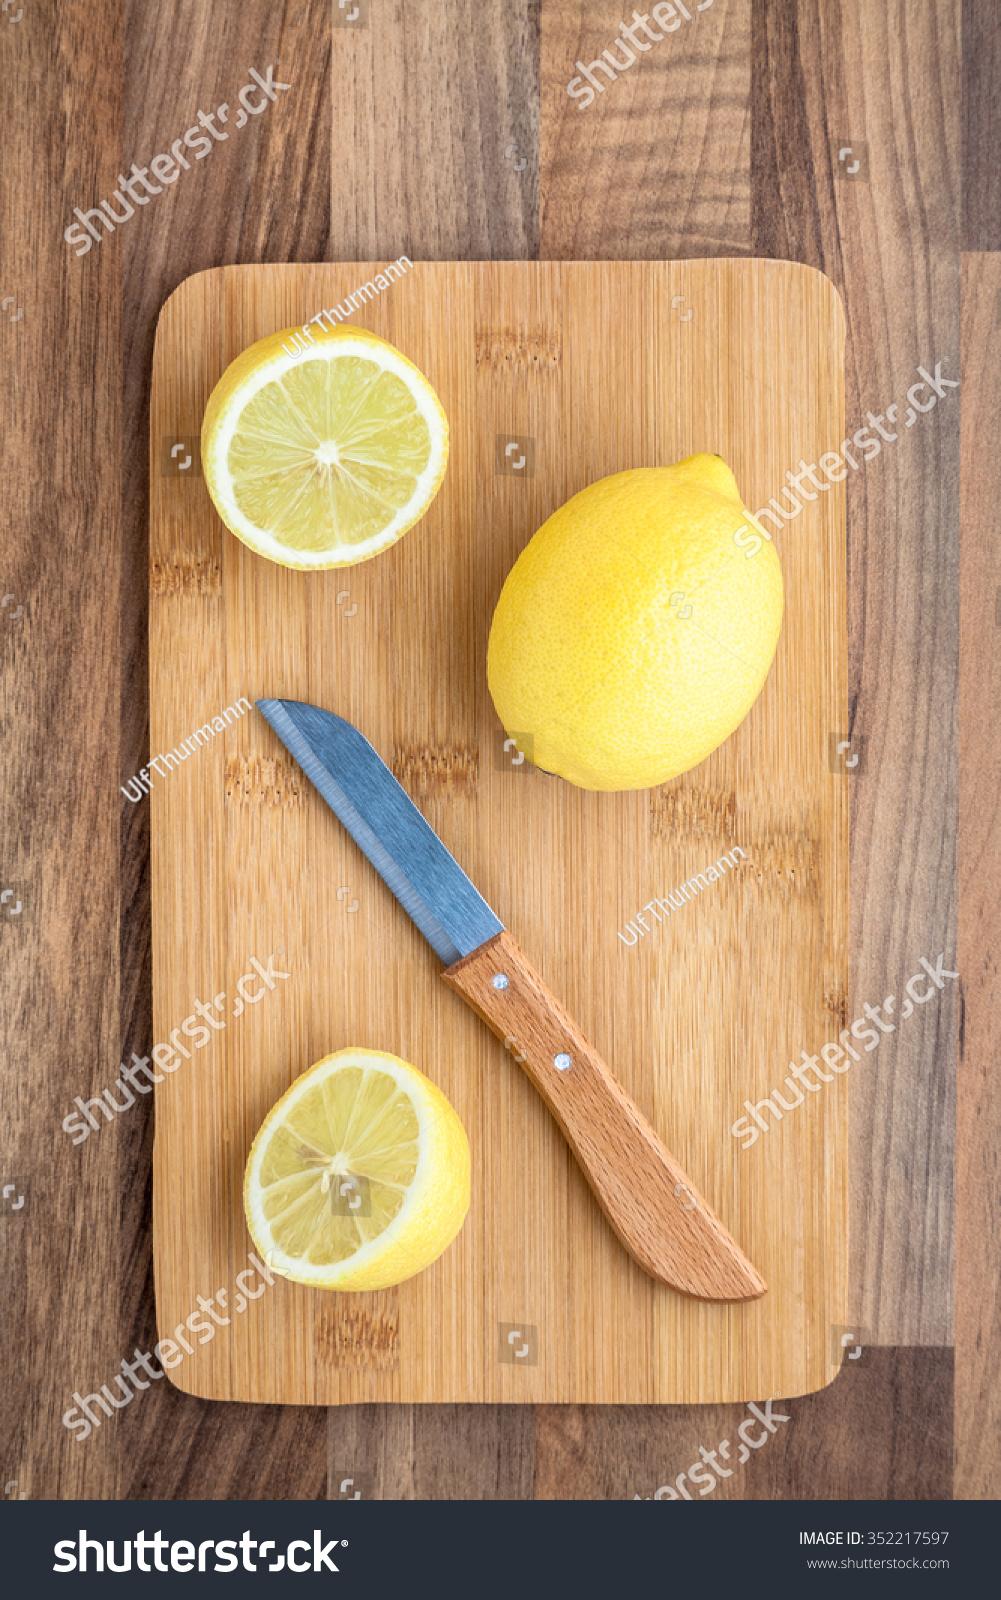 Lemons Chopping Board Knife Stock Photo 352217597 ...